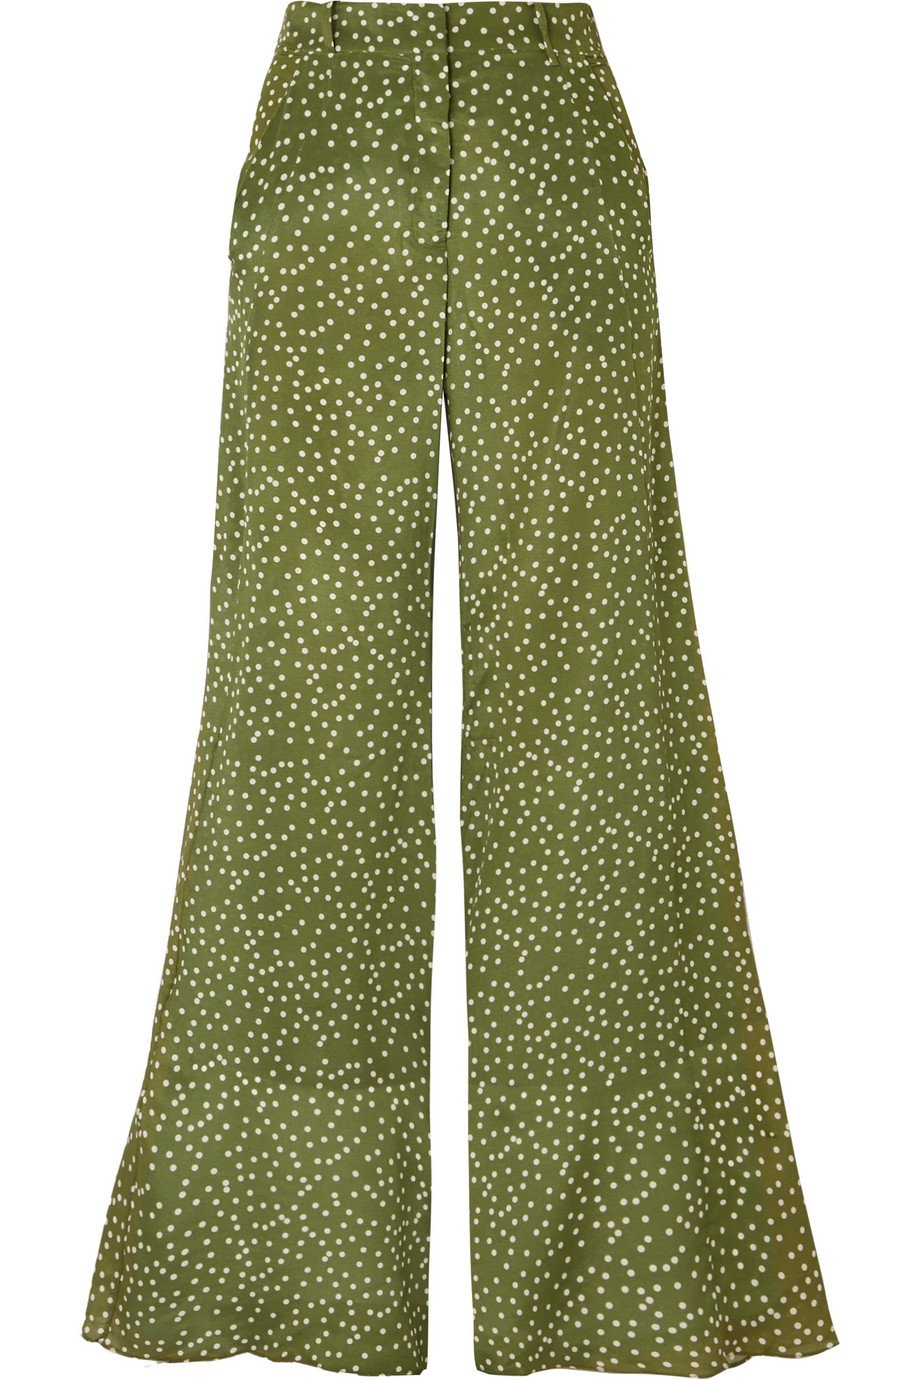 Adriana Degreas | Millie Punti polka-dot silk crepe de chine wide-leg pants | NET-A-PORTER.COM